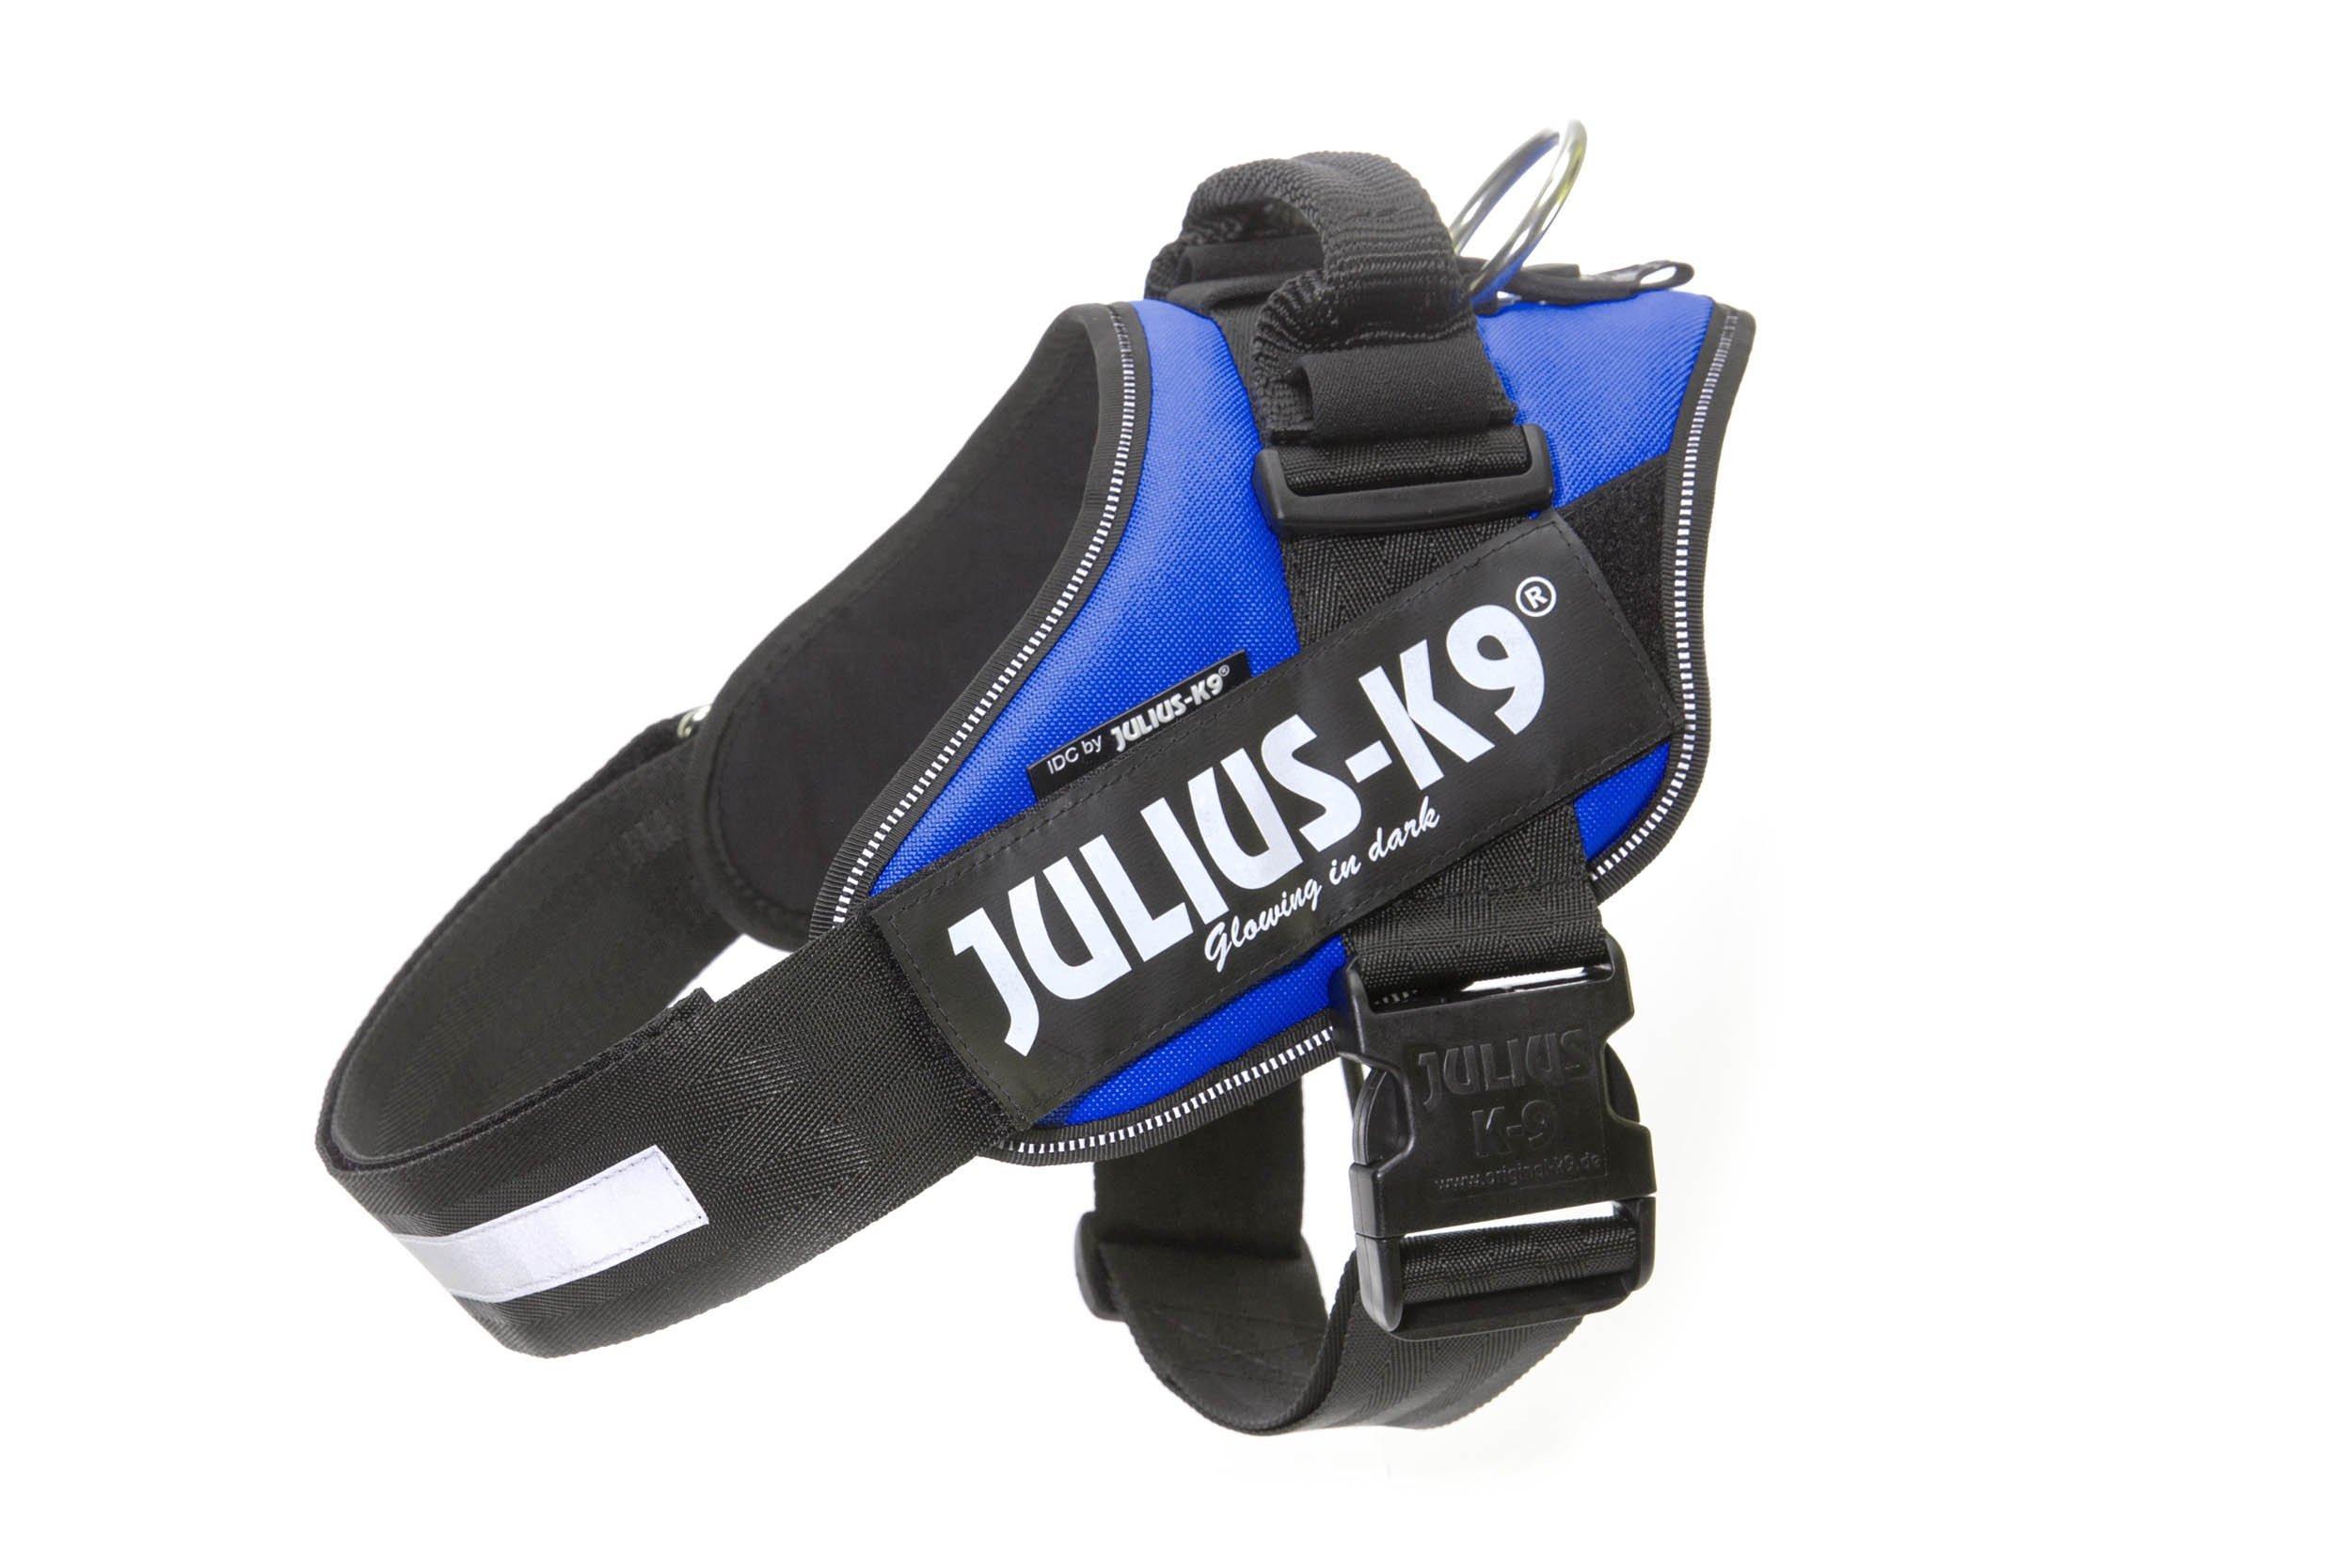 Julius-K9 16IDC-B-3 IDC Power Harness, Size: 3 (82-115cm/32.5-46.5''), Blue